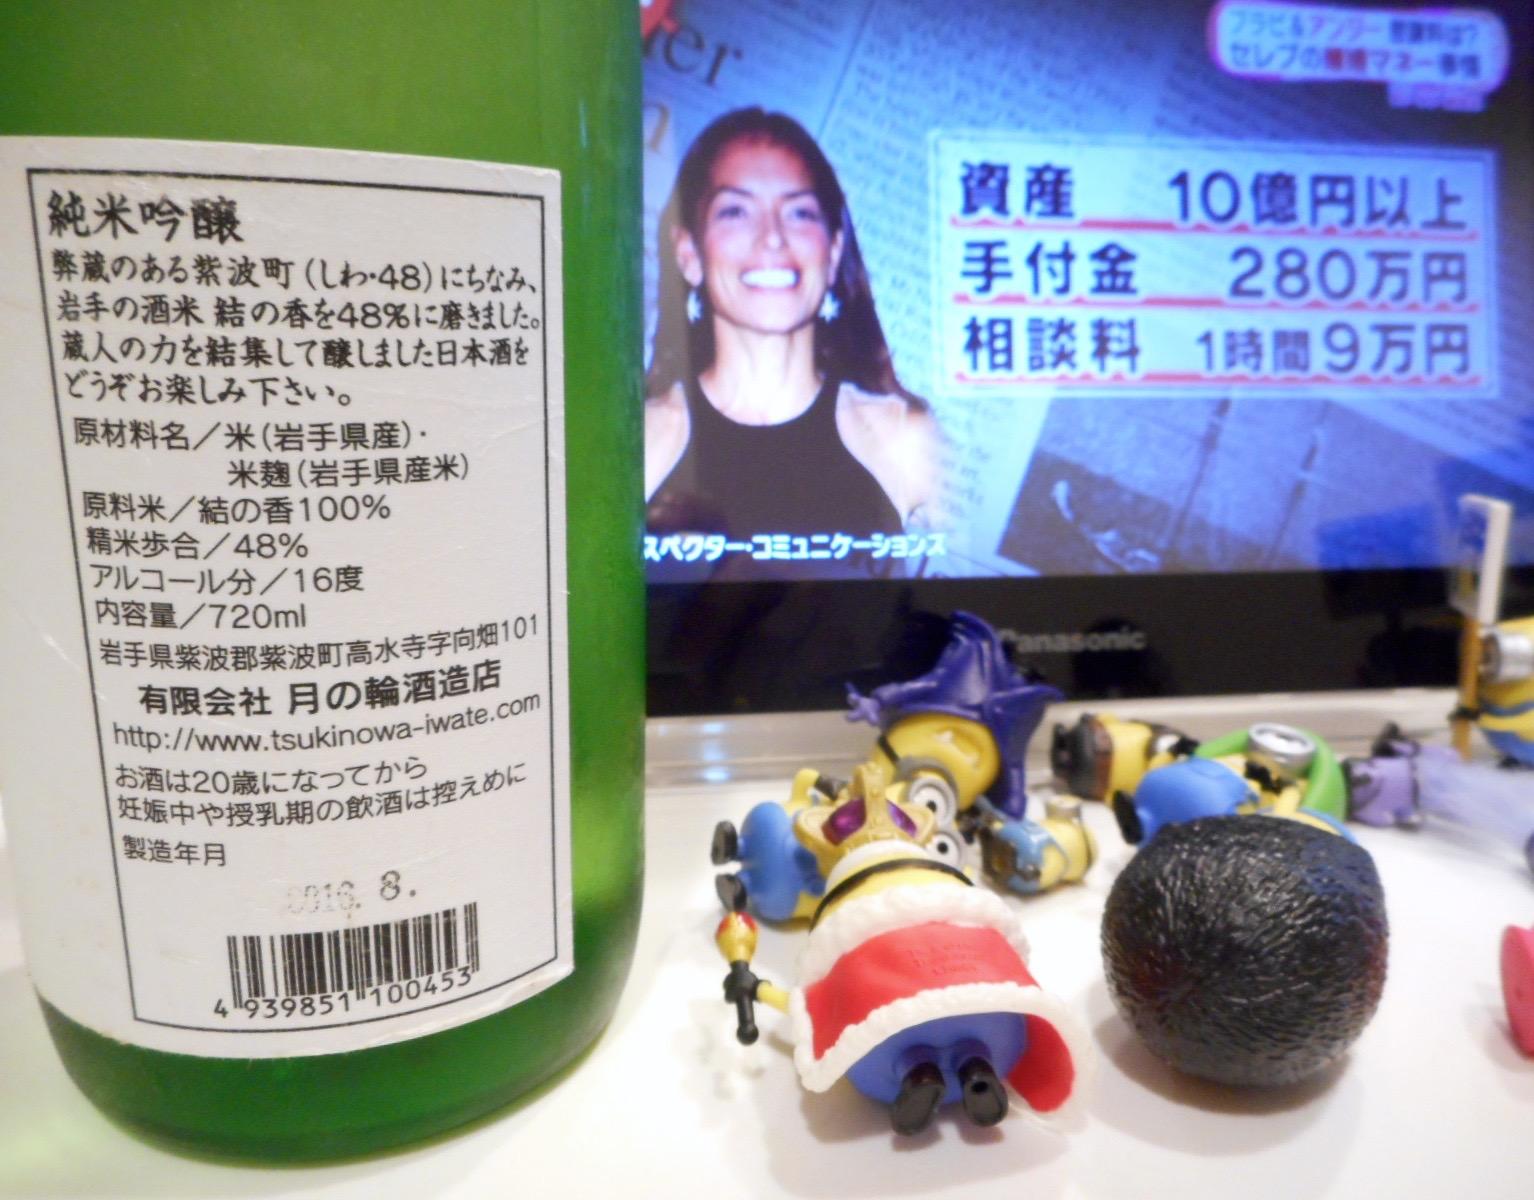 tsukinowa_yuinoka48_27by2.jpg